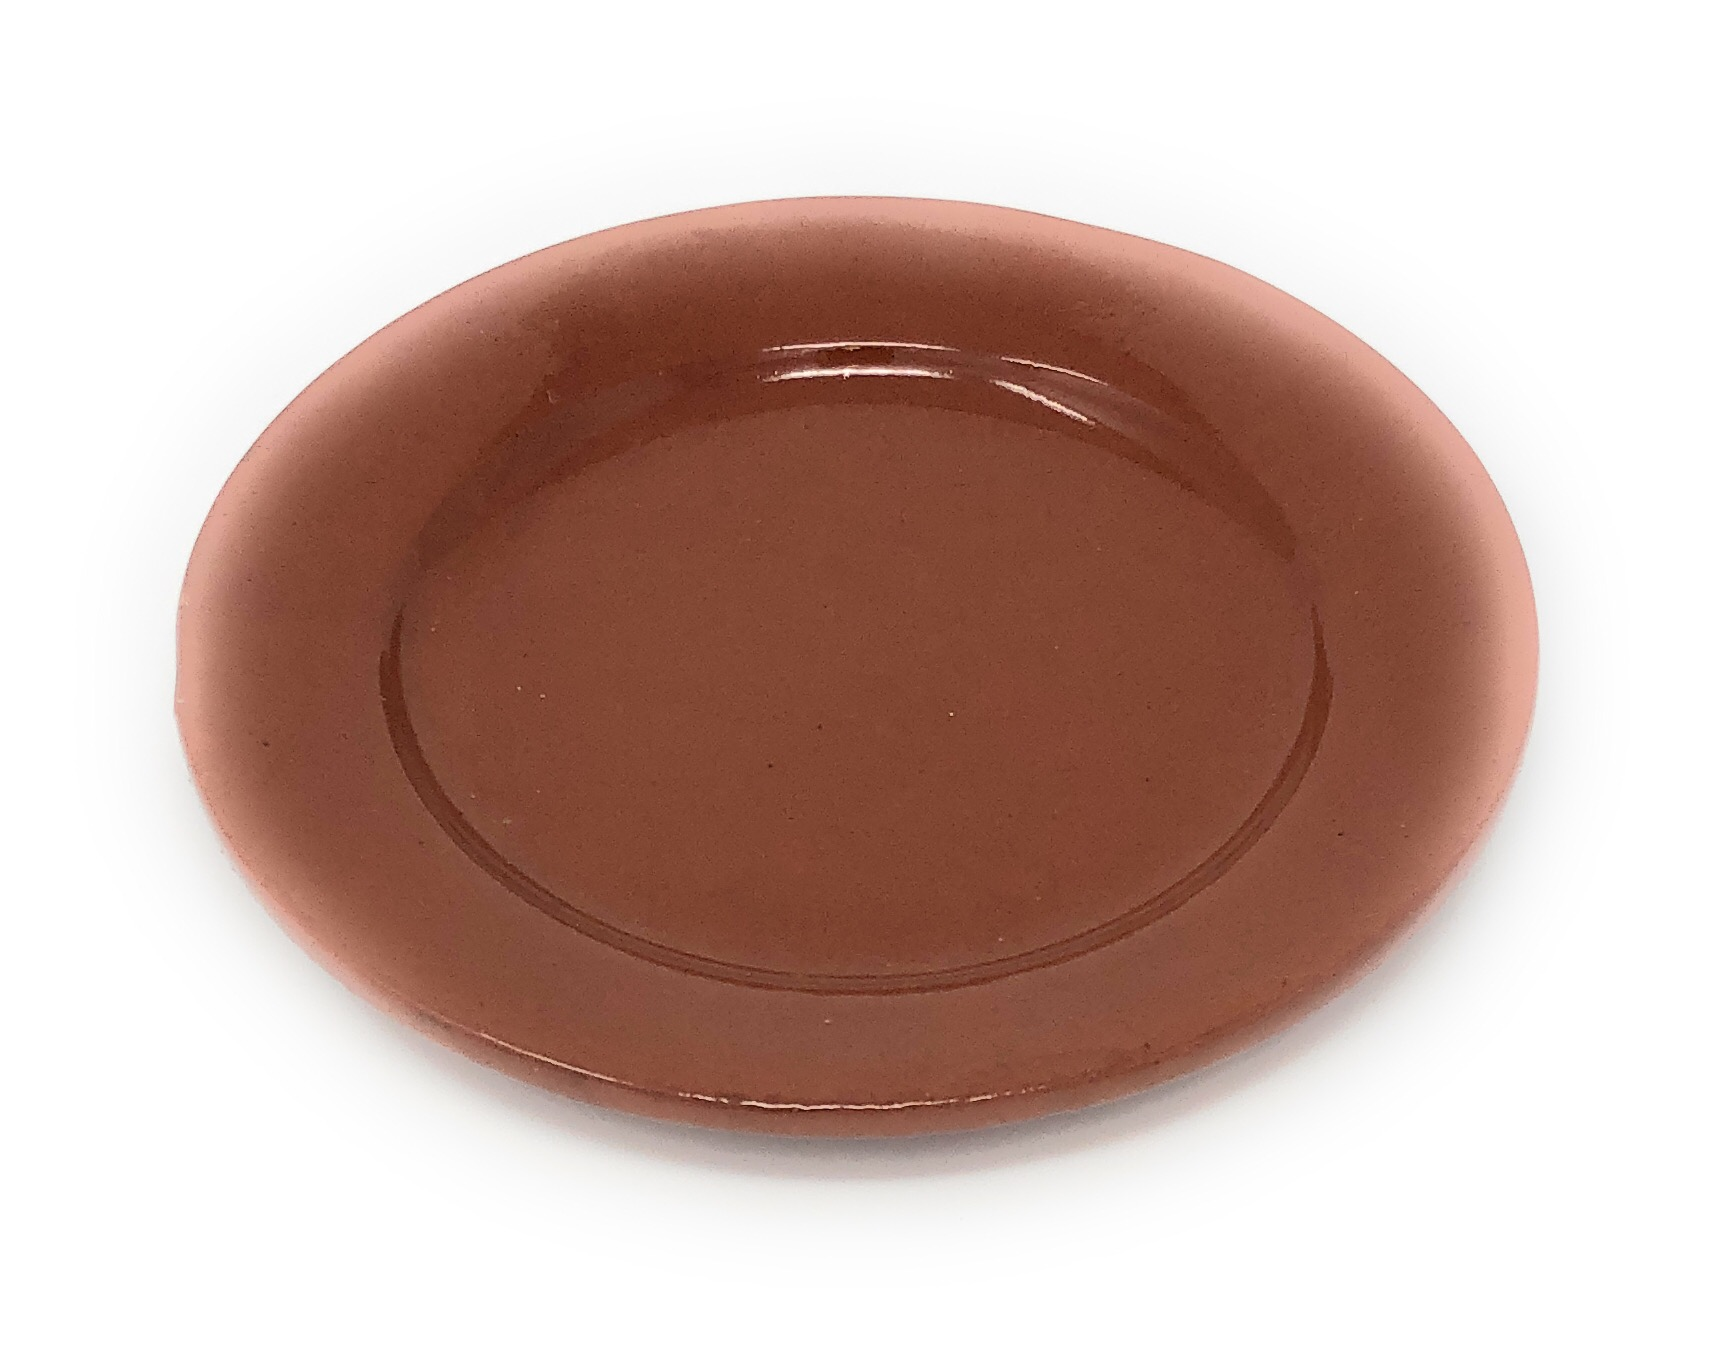 Alfareria Padilla Cazuela Keramikteller Brotteller, braun 16,5cm